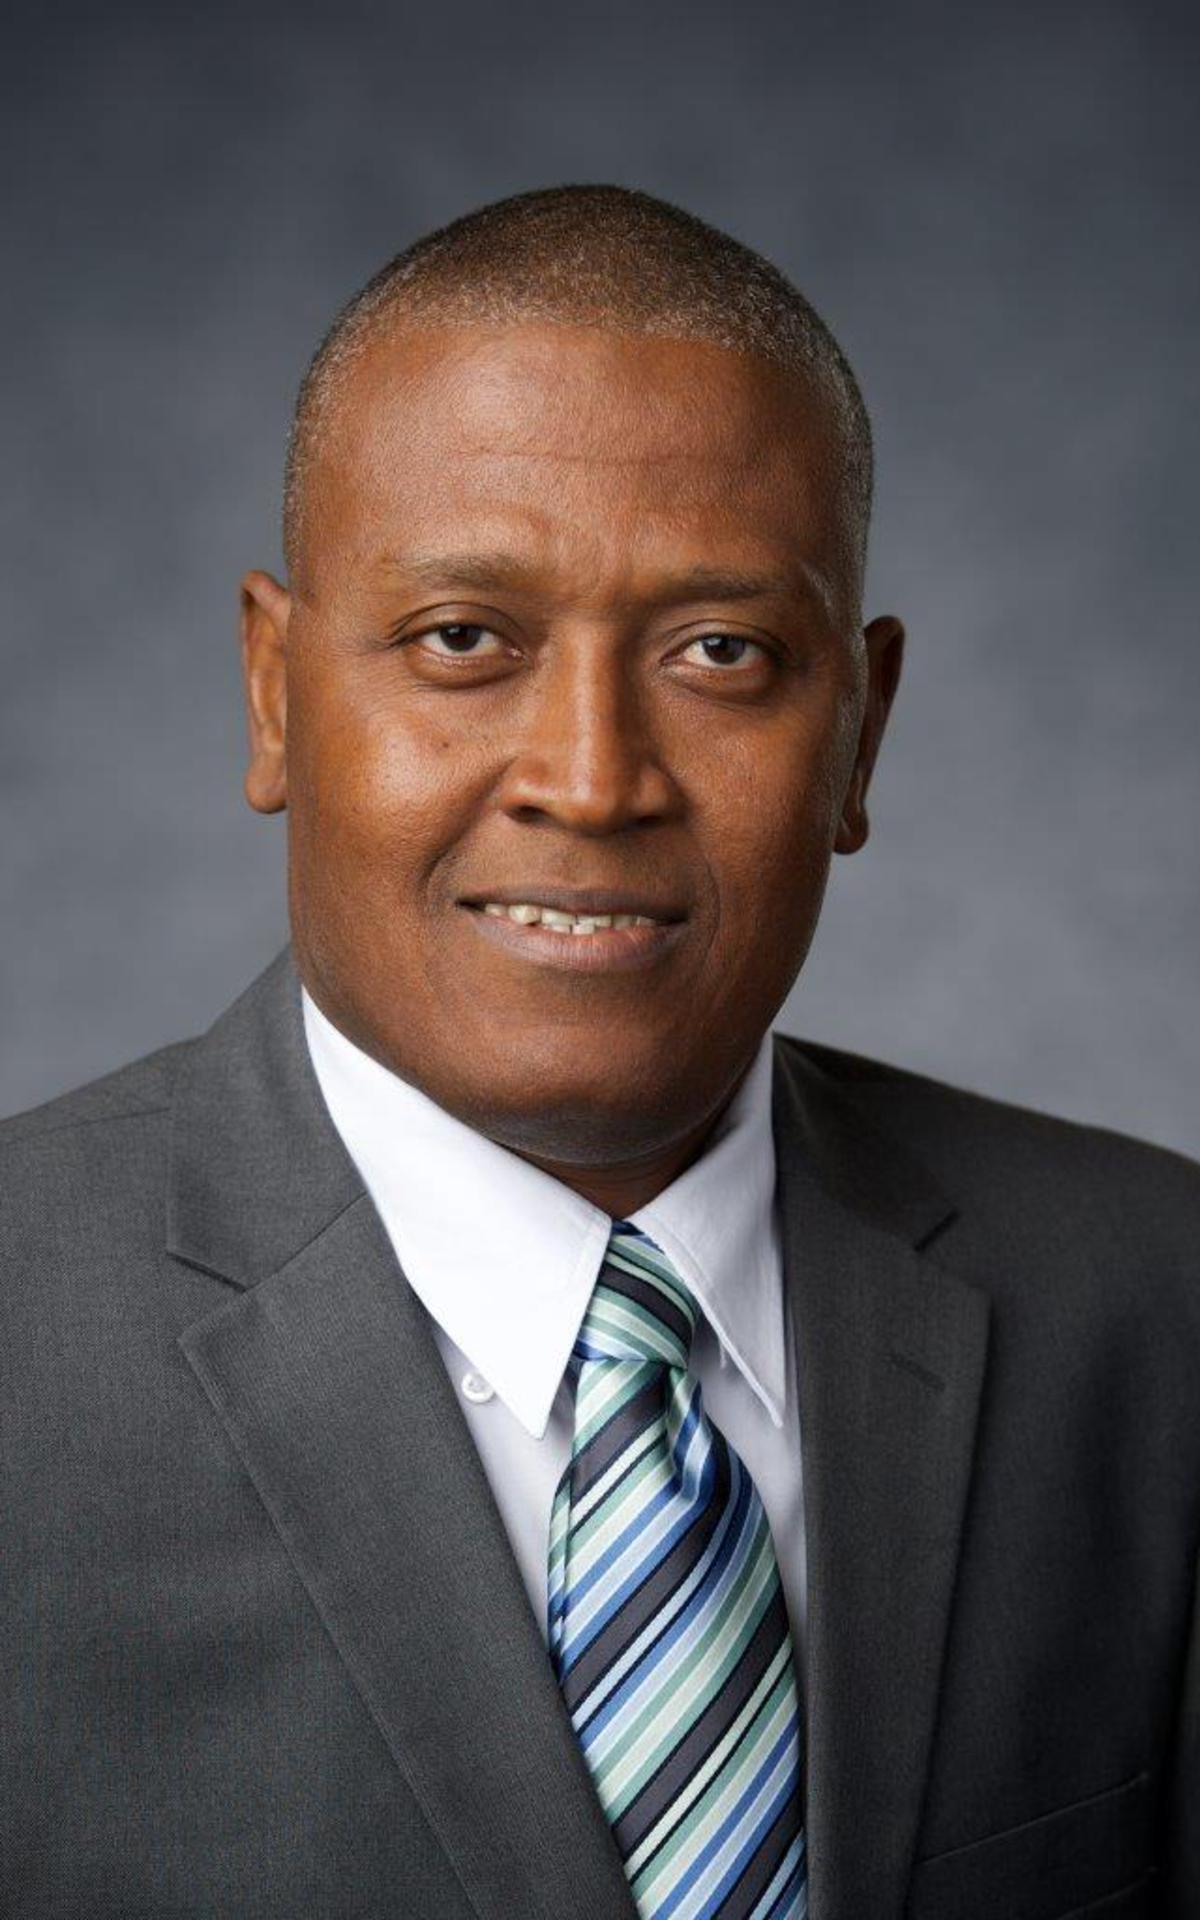 Elder Hubermann Bien-Aimé